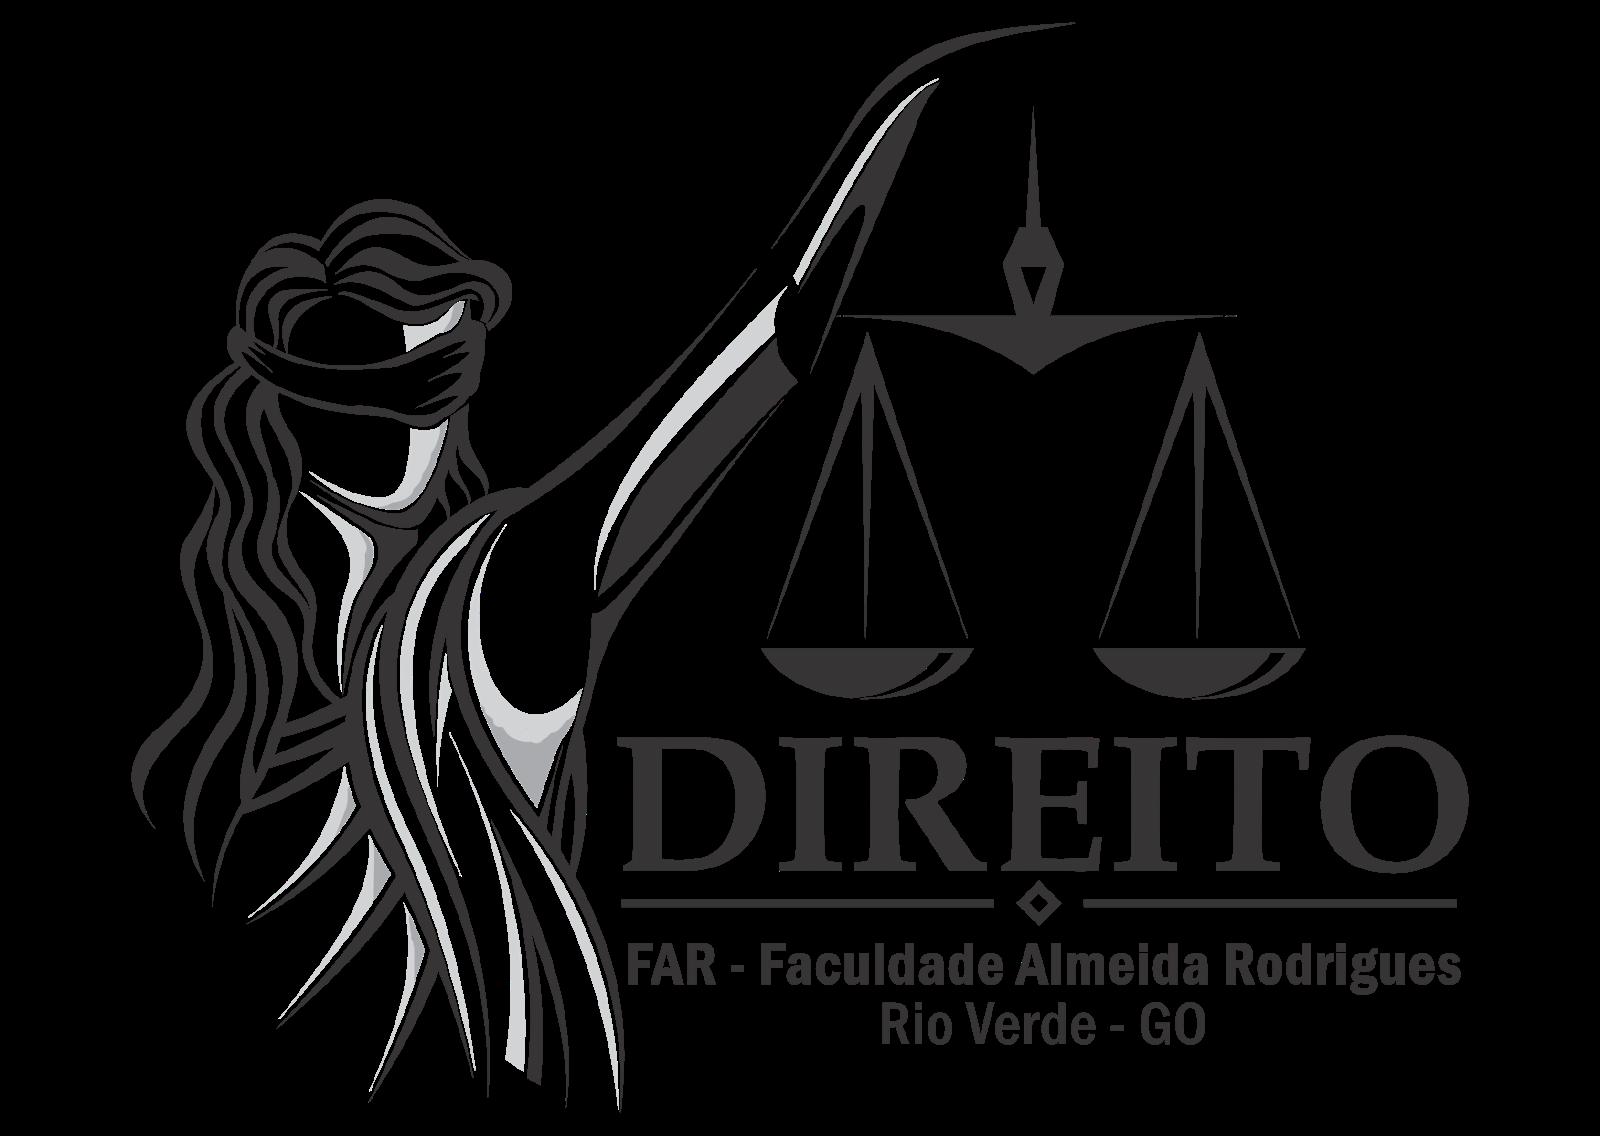 Direito FAR Logo Vector ~ Format Cdr, Ai, Eps, Svg, PDF, PNG